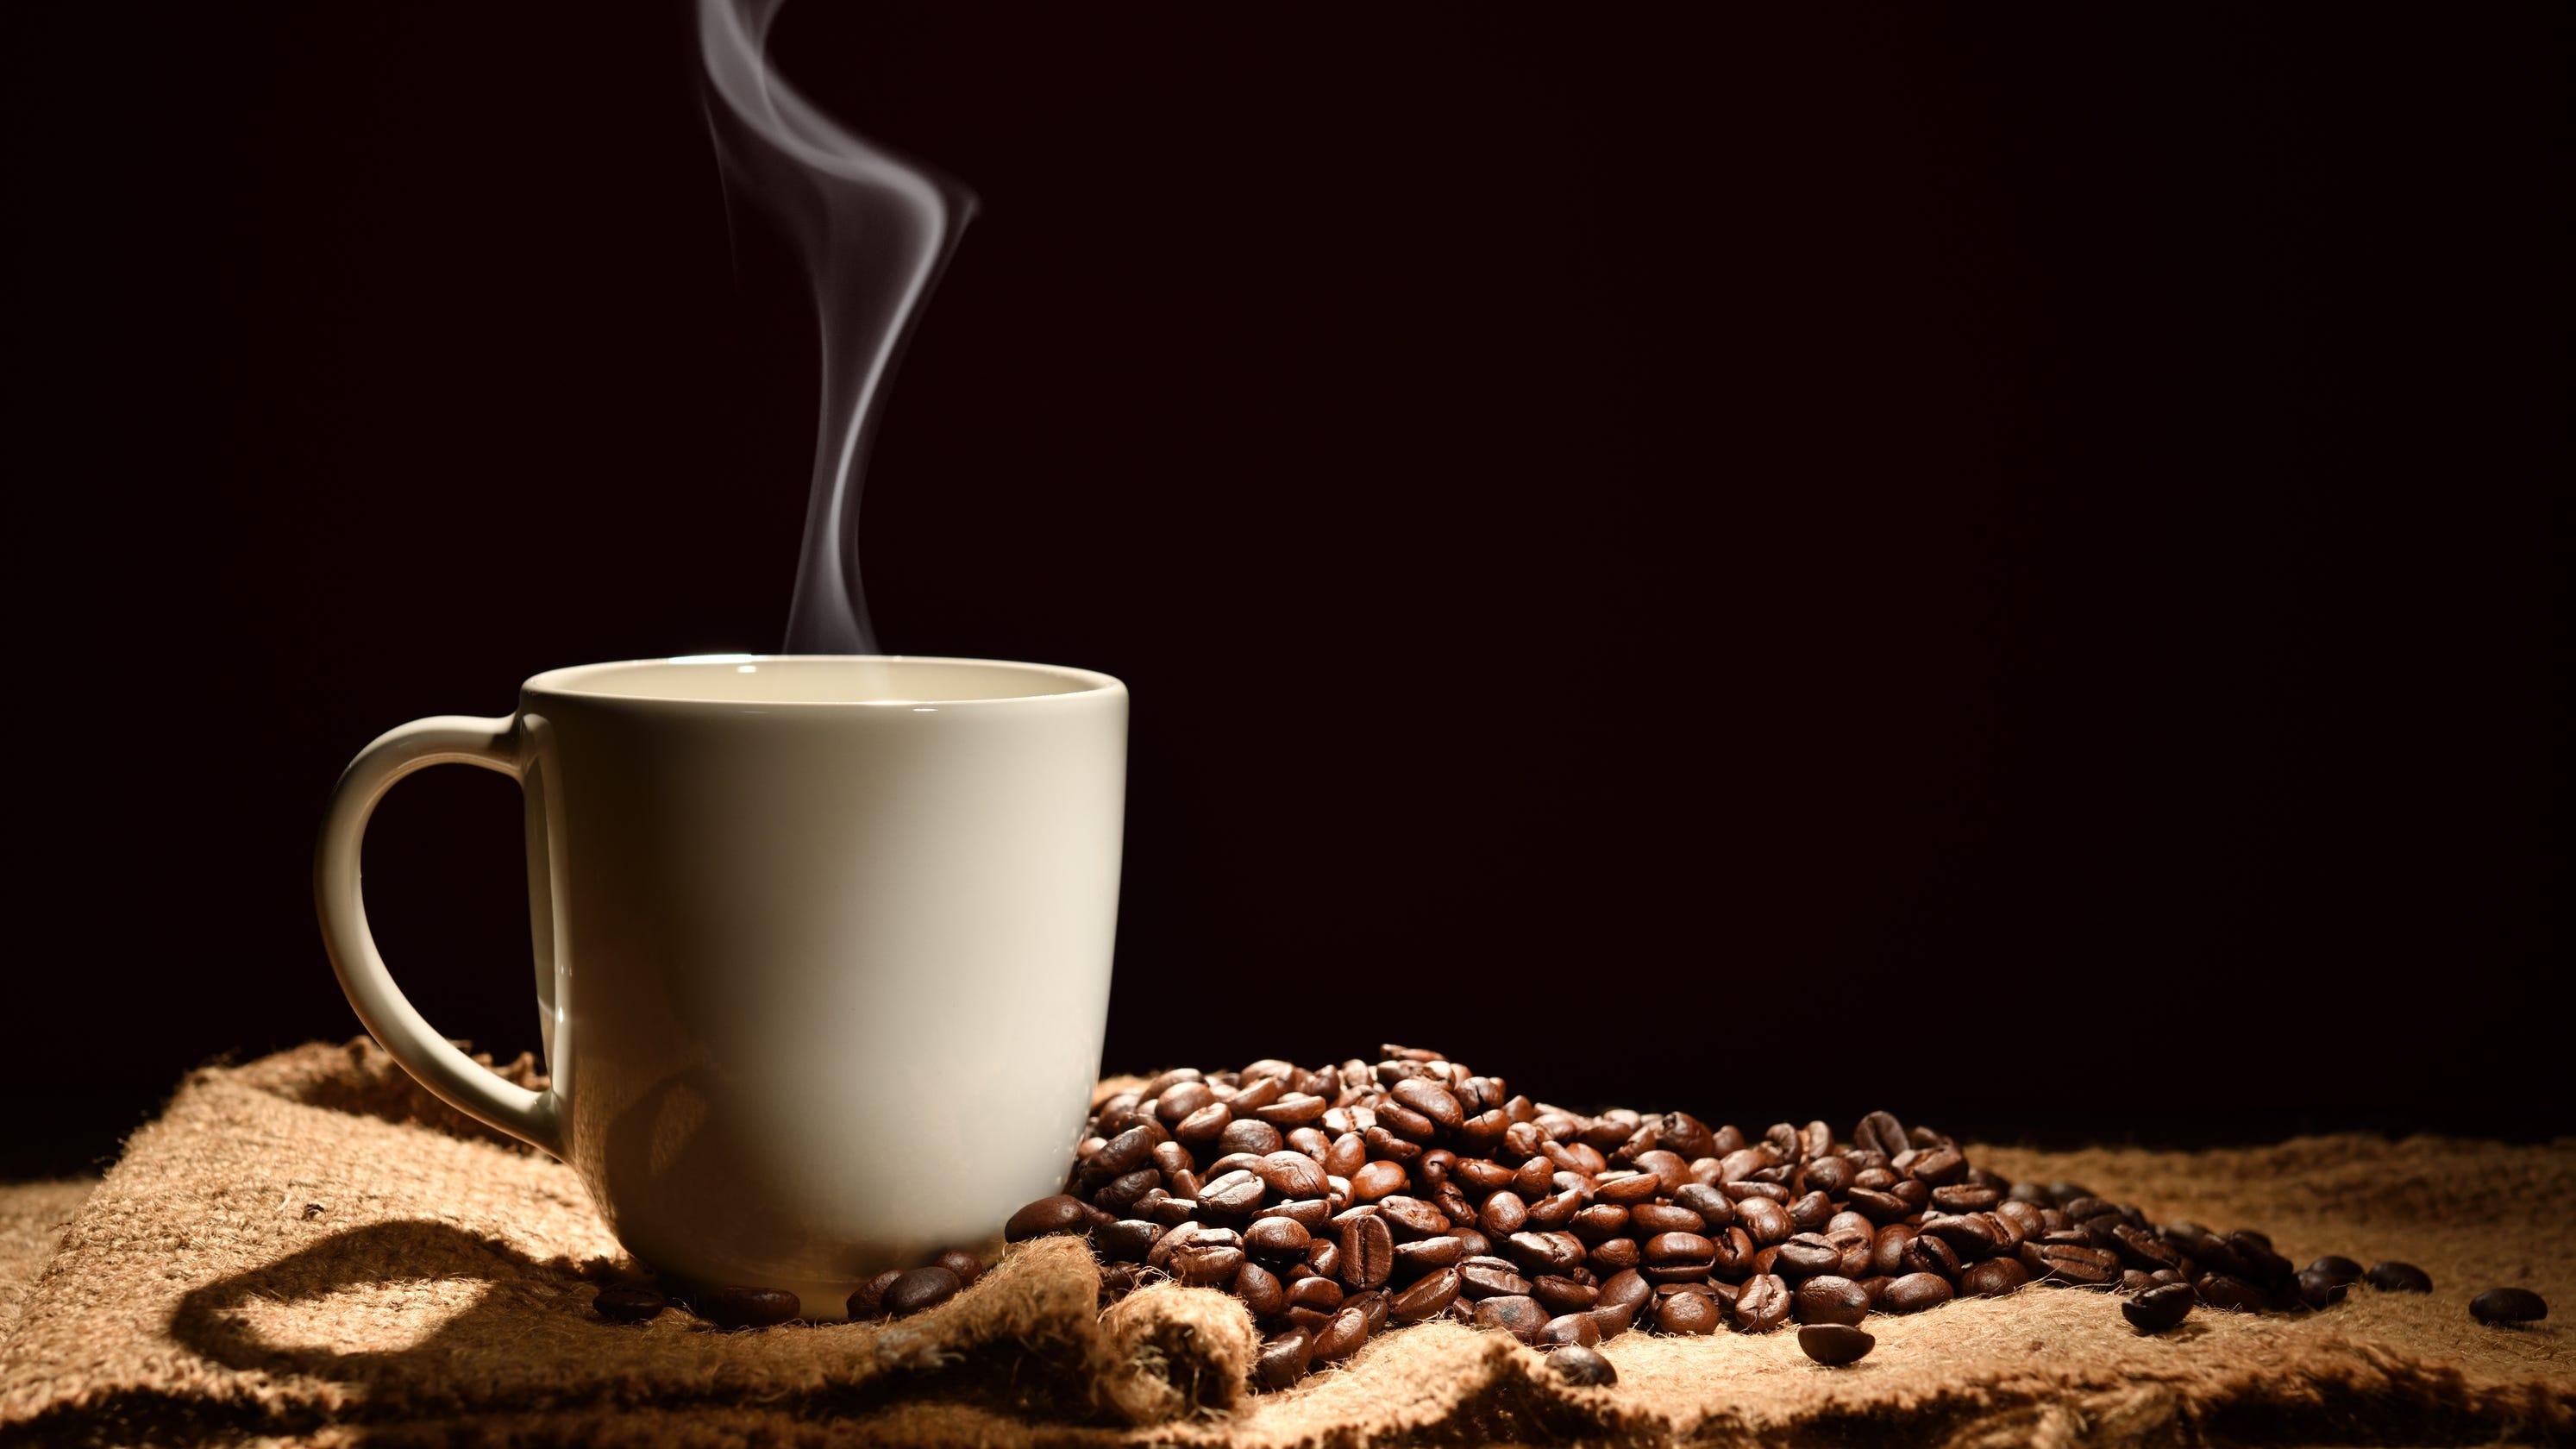 coffee的圖片搜尋結果